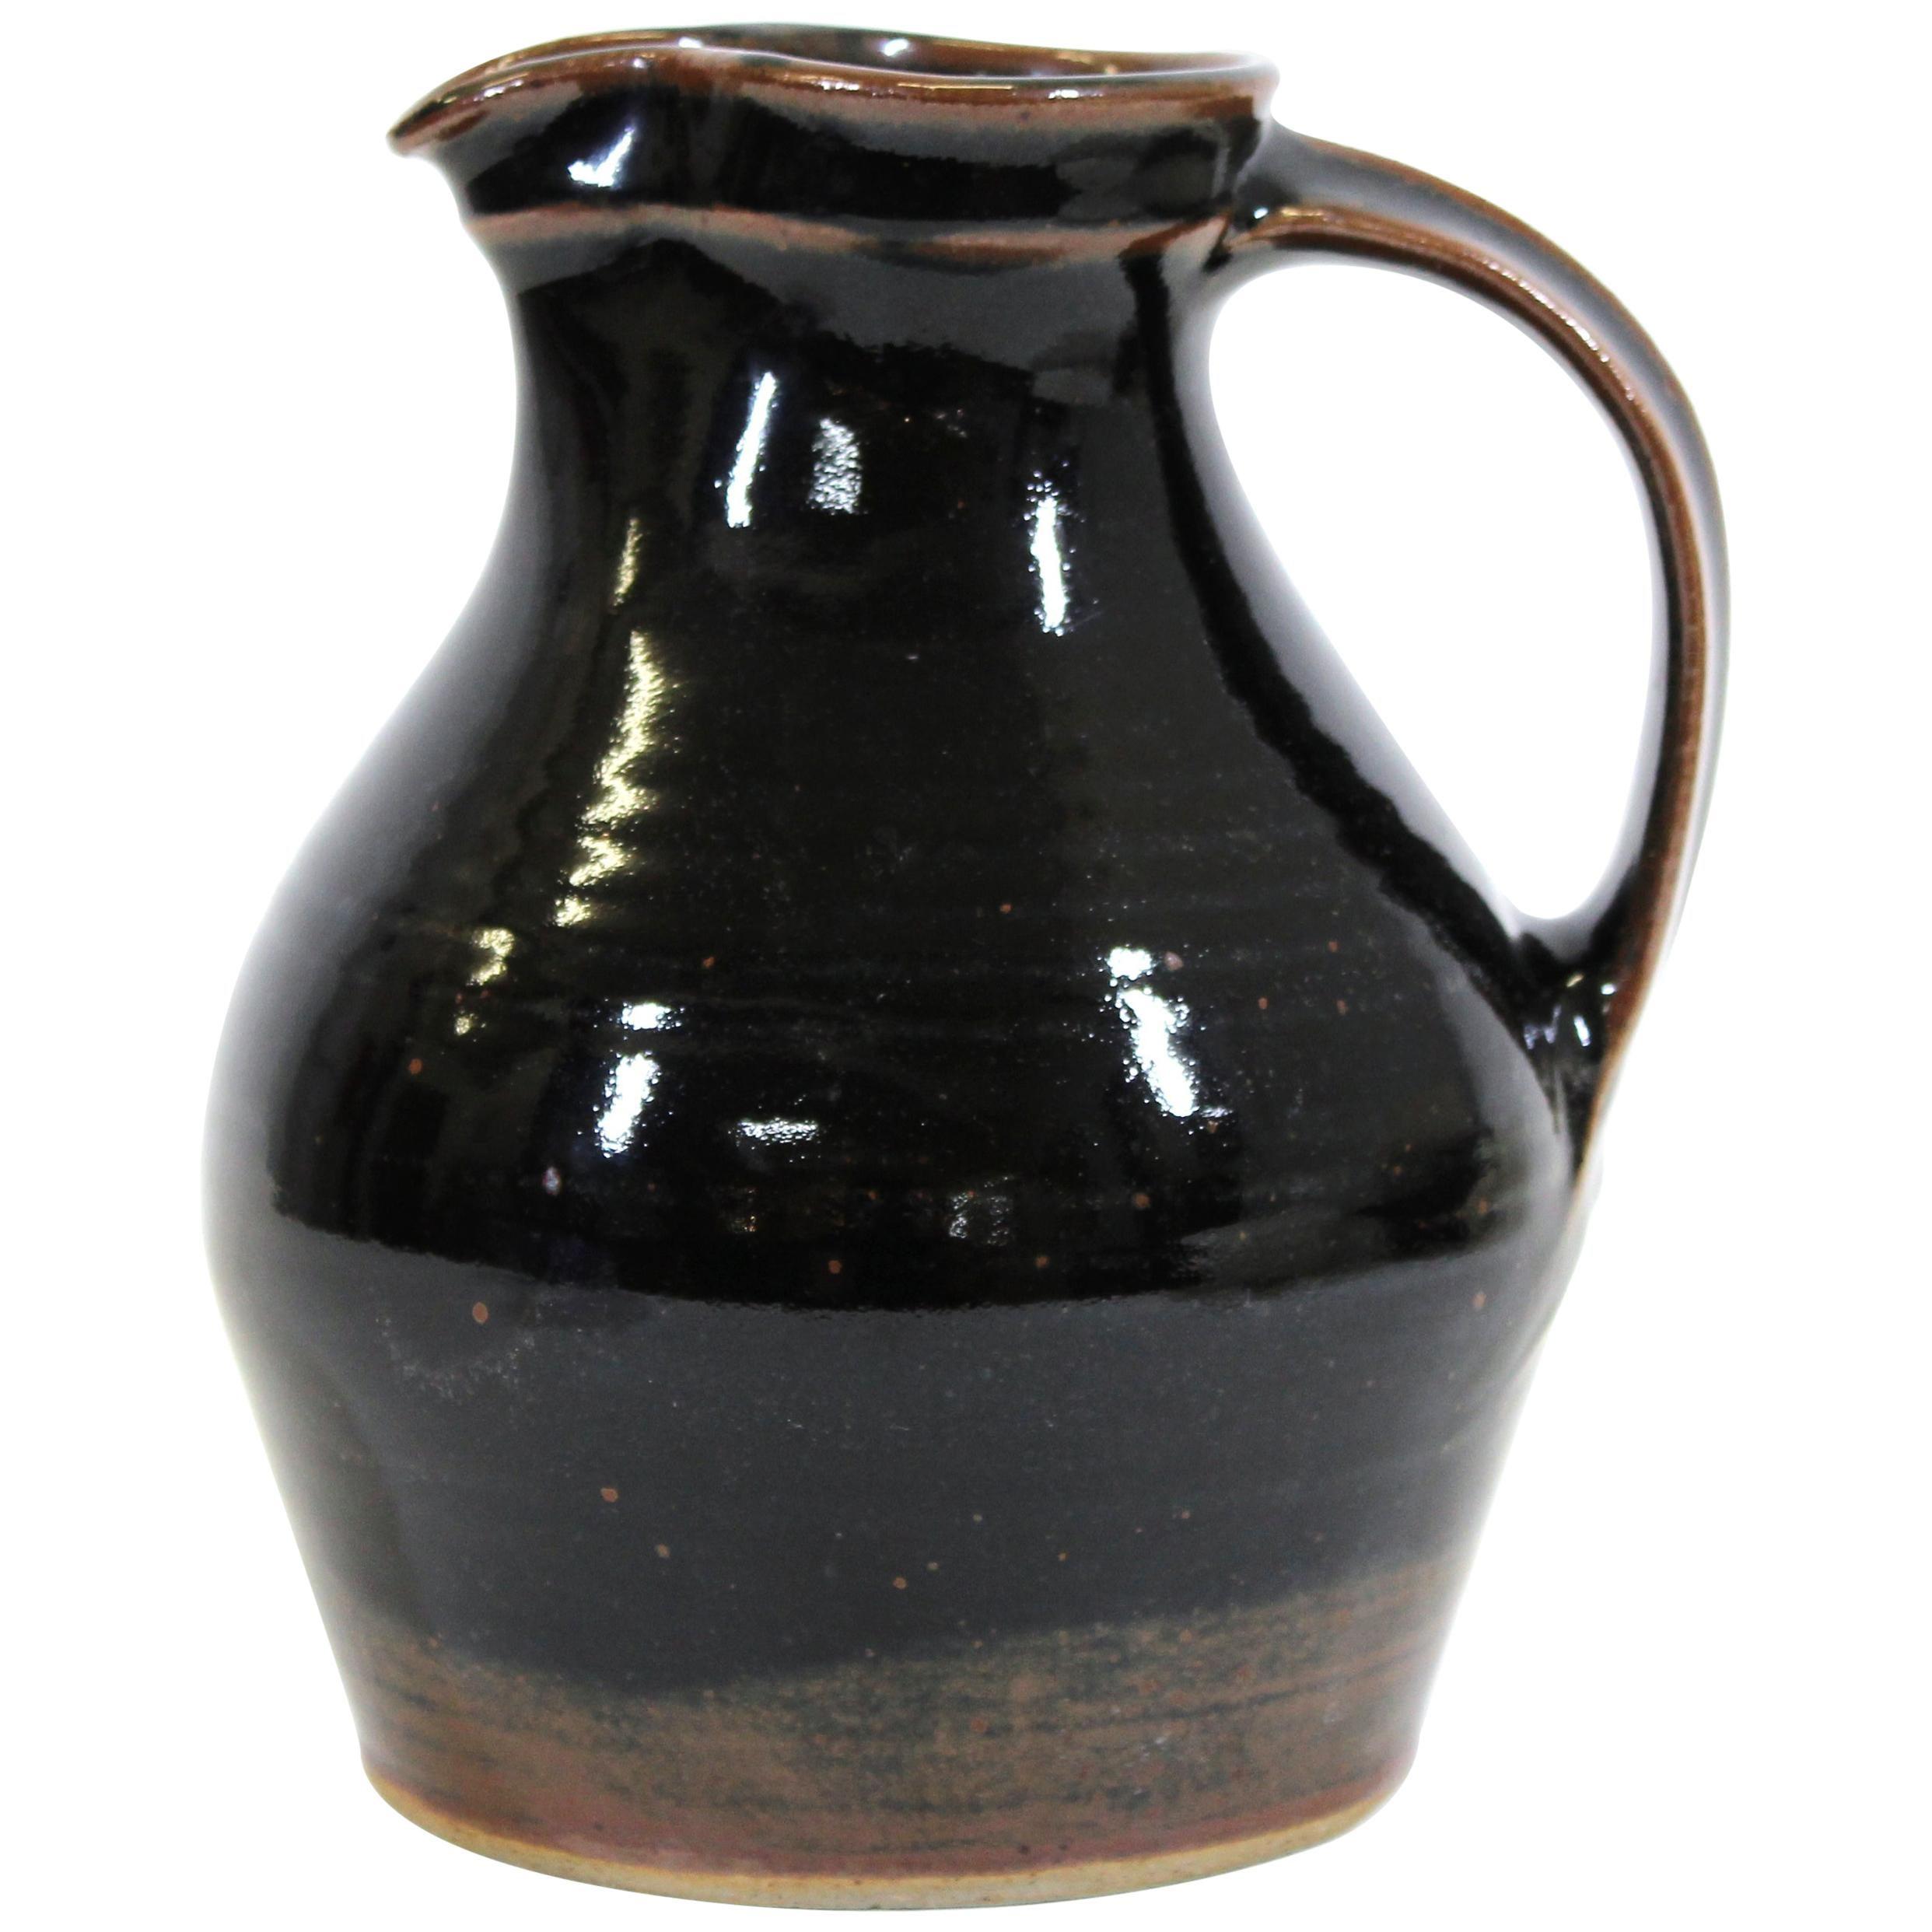 David Leach for Lowerdown Pottery Mid-Century Modern Stoneware Jug